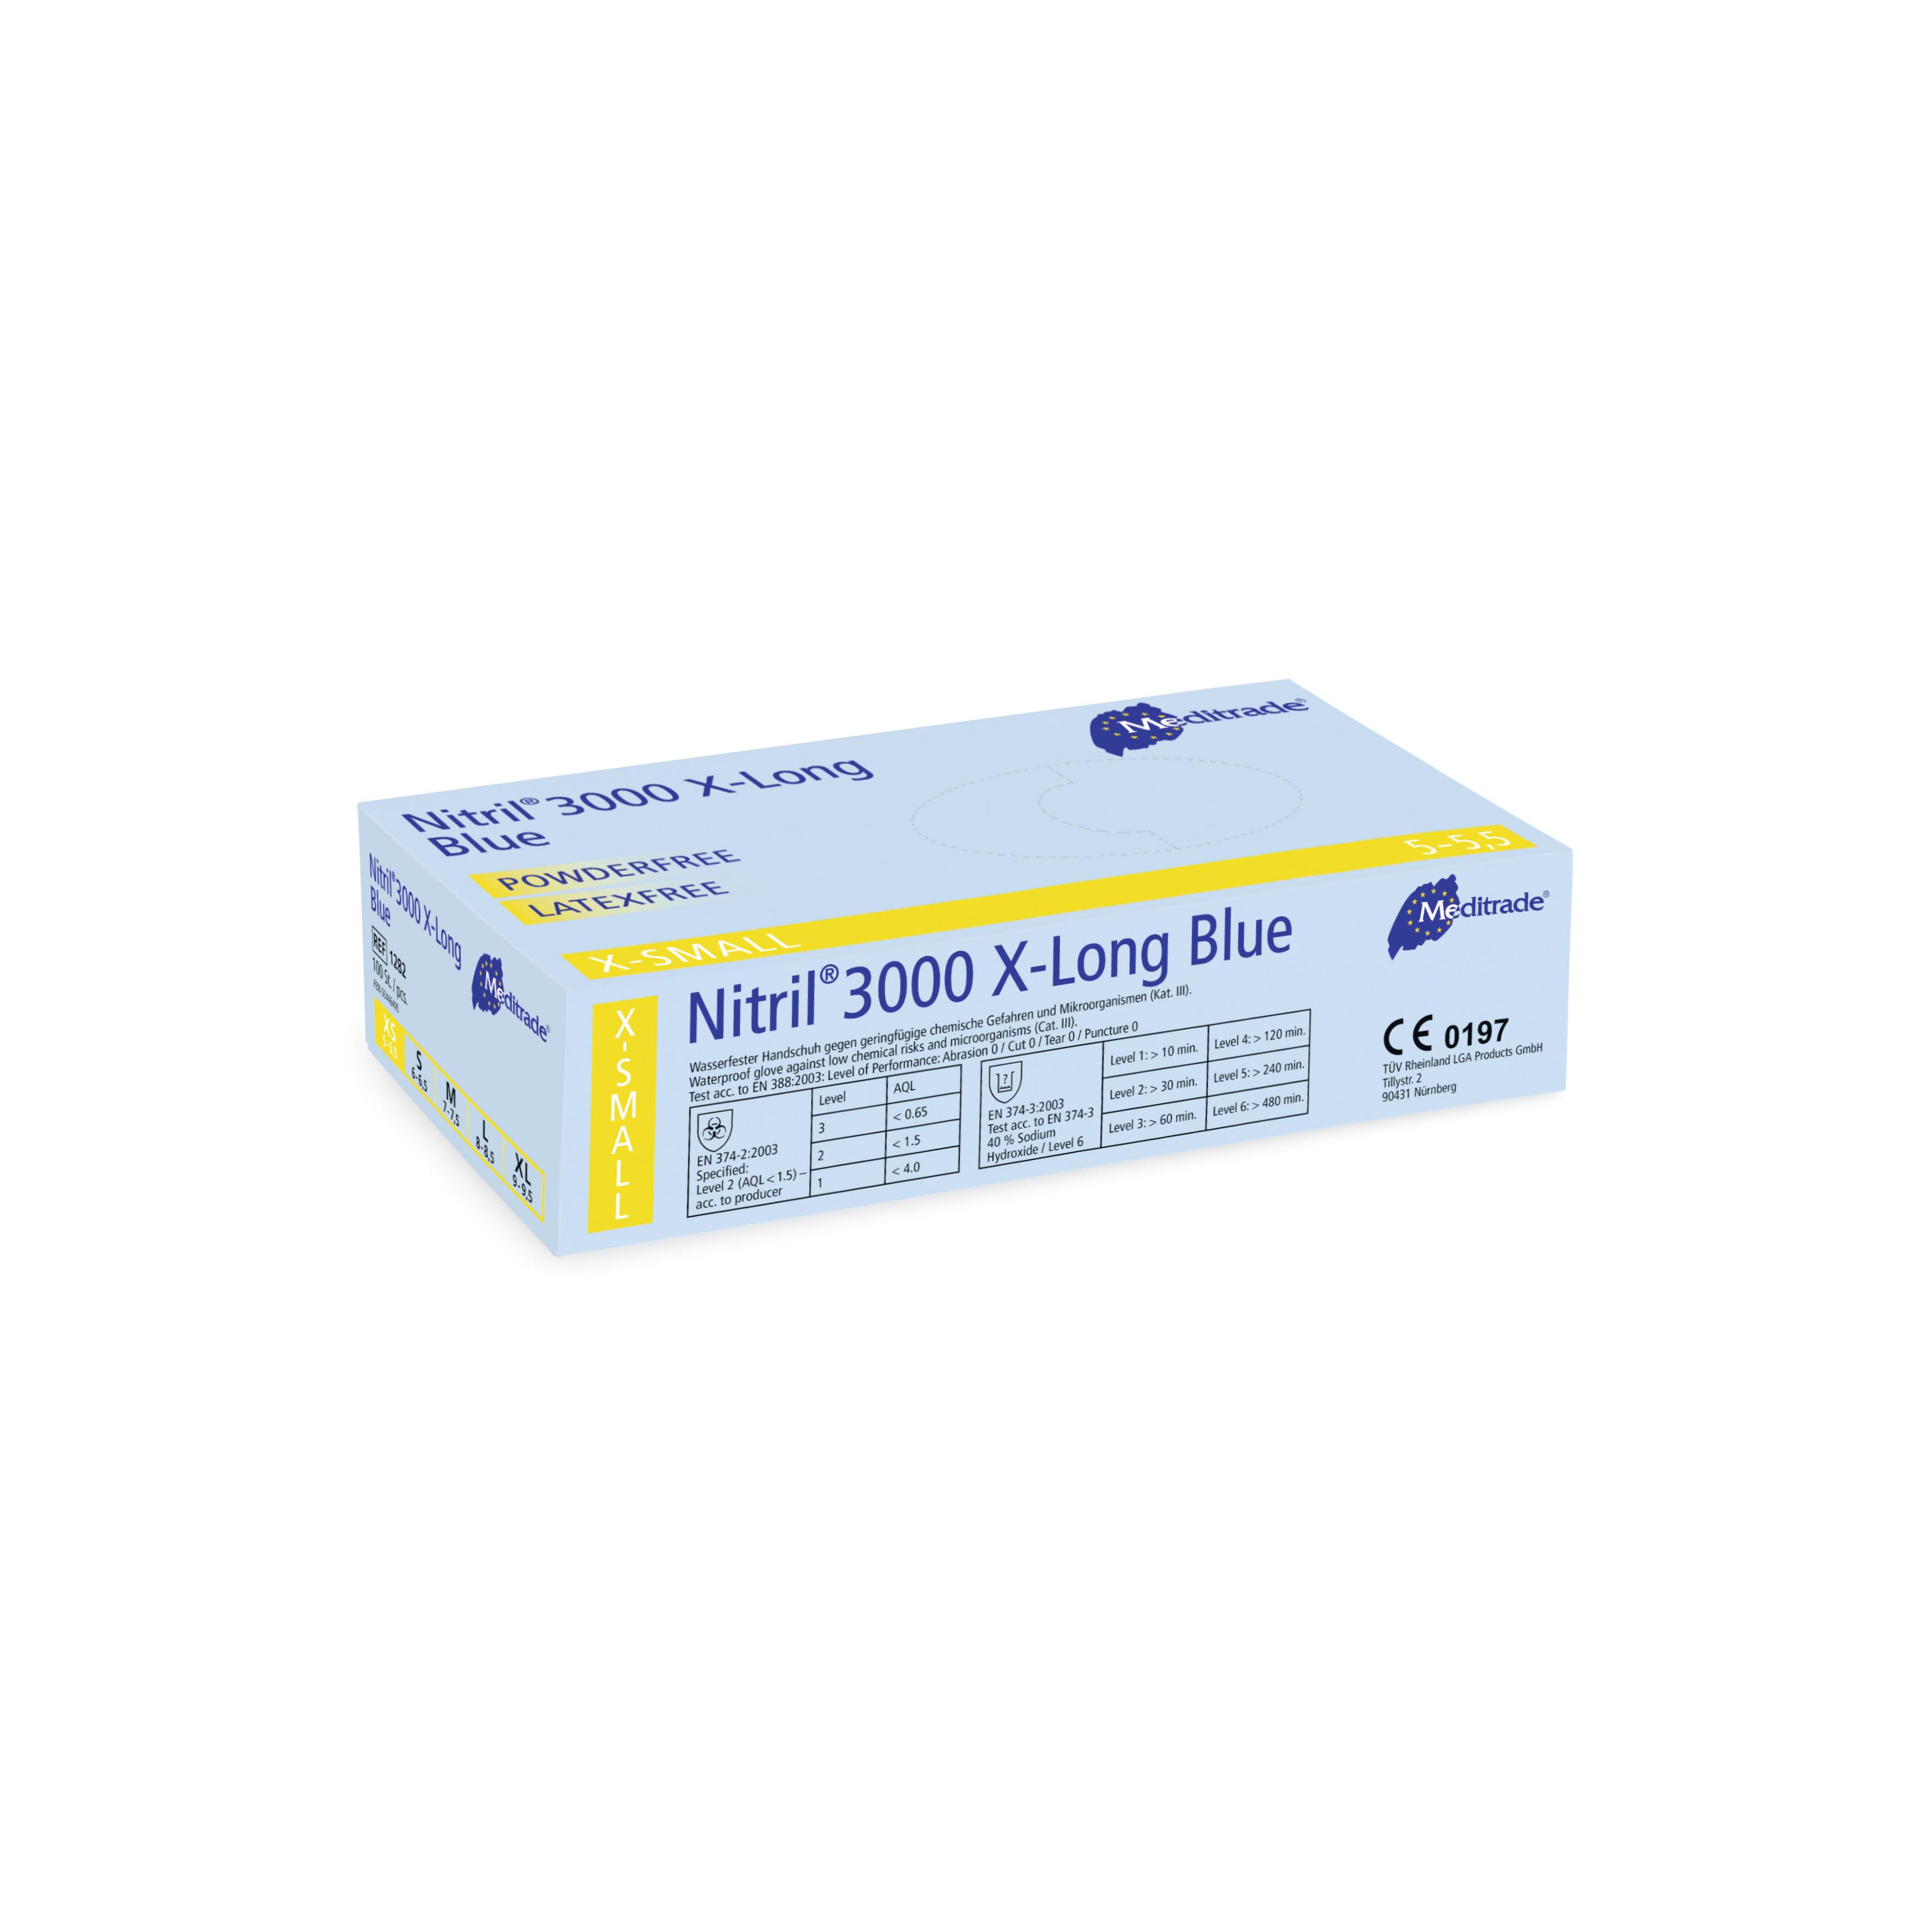 Nitril 3000 X-Long Blue - Nitrilhandschuhe